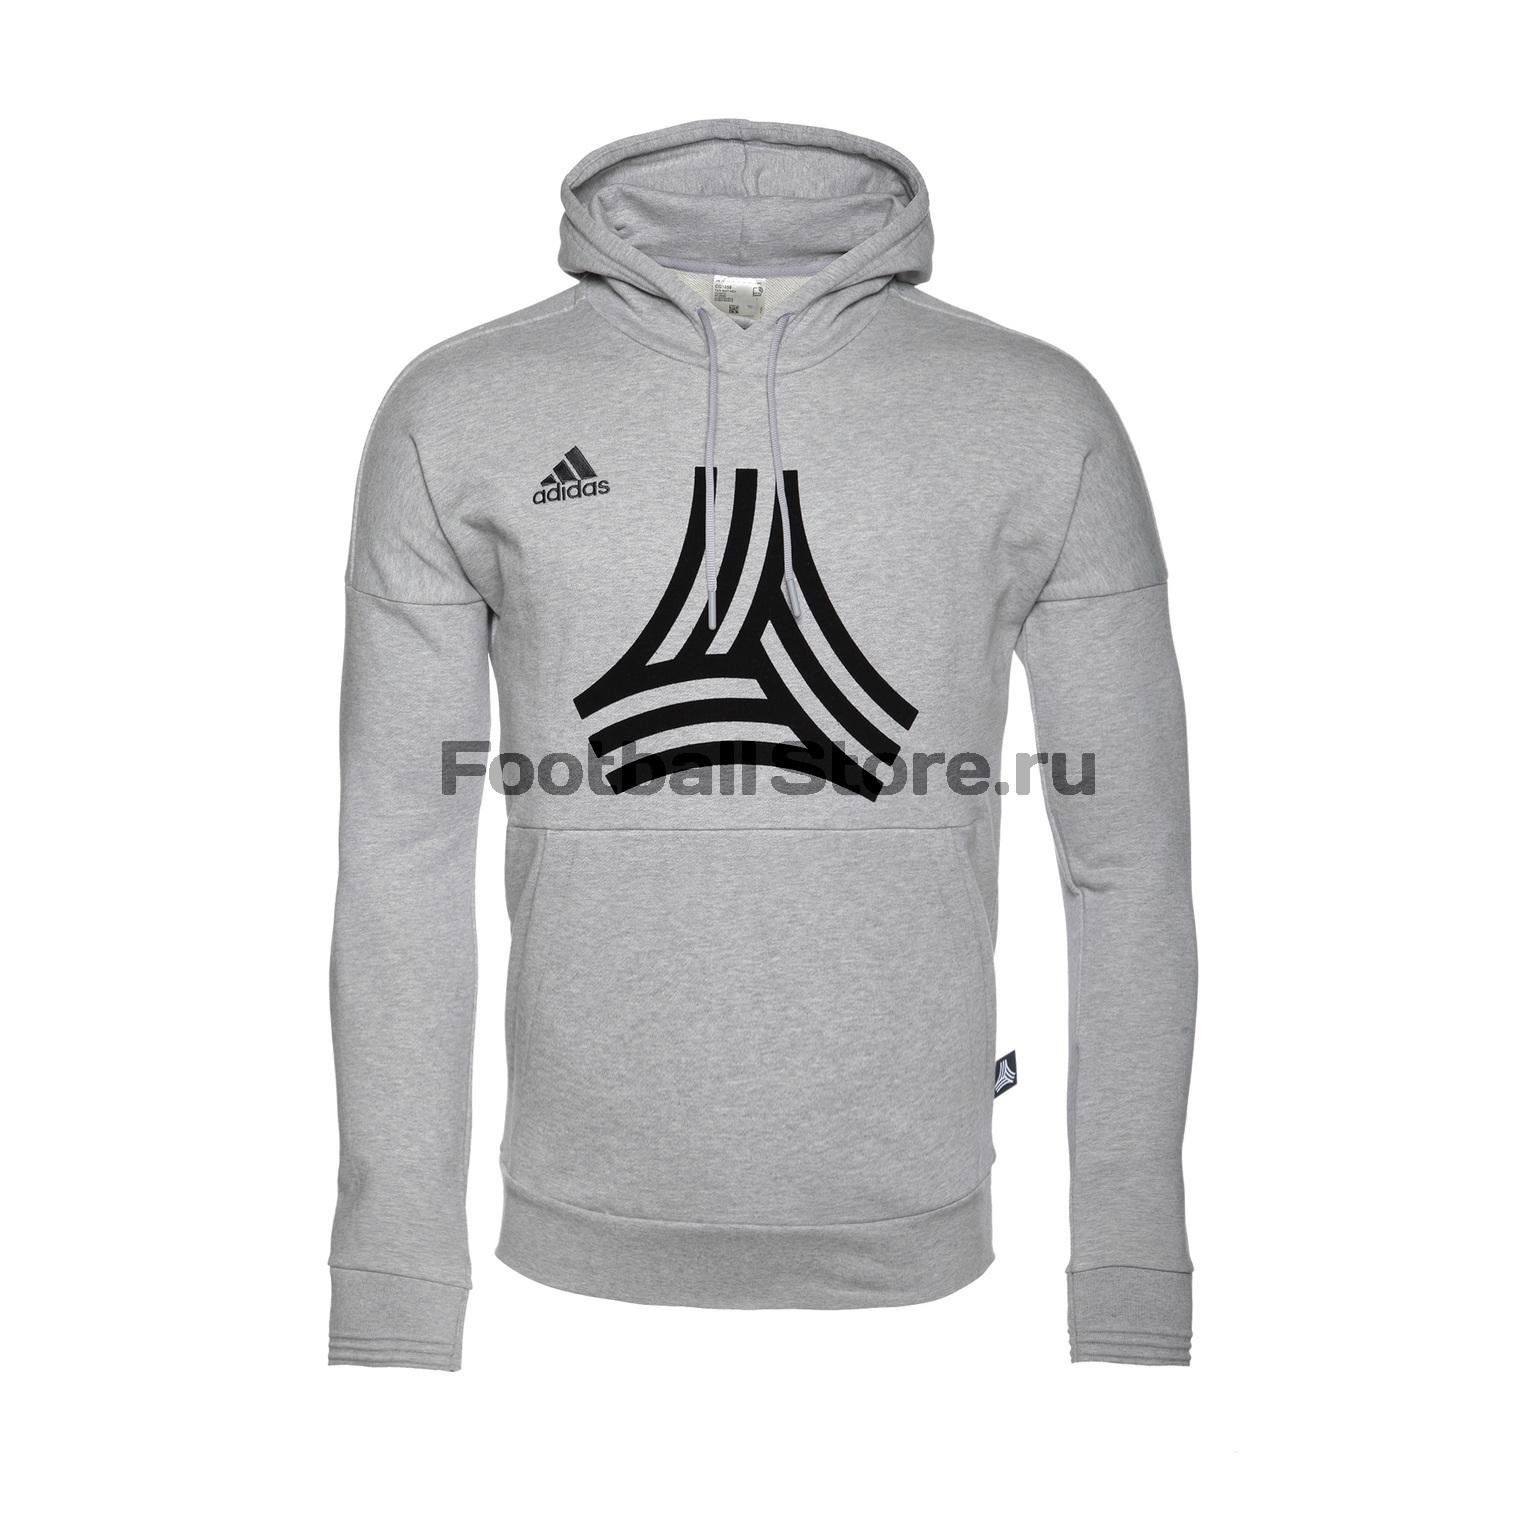 Толстовка Adidas Tango Hoodie CG1858 цена 2017